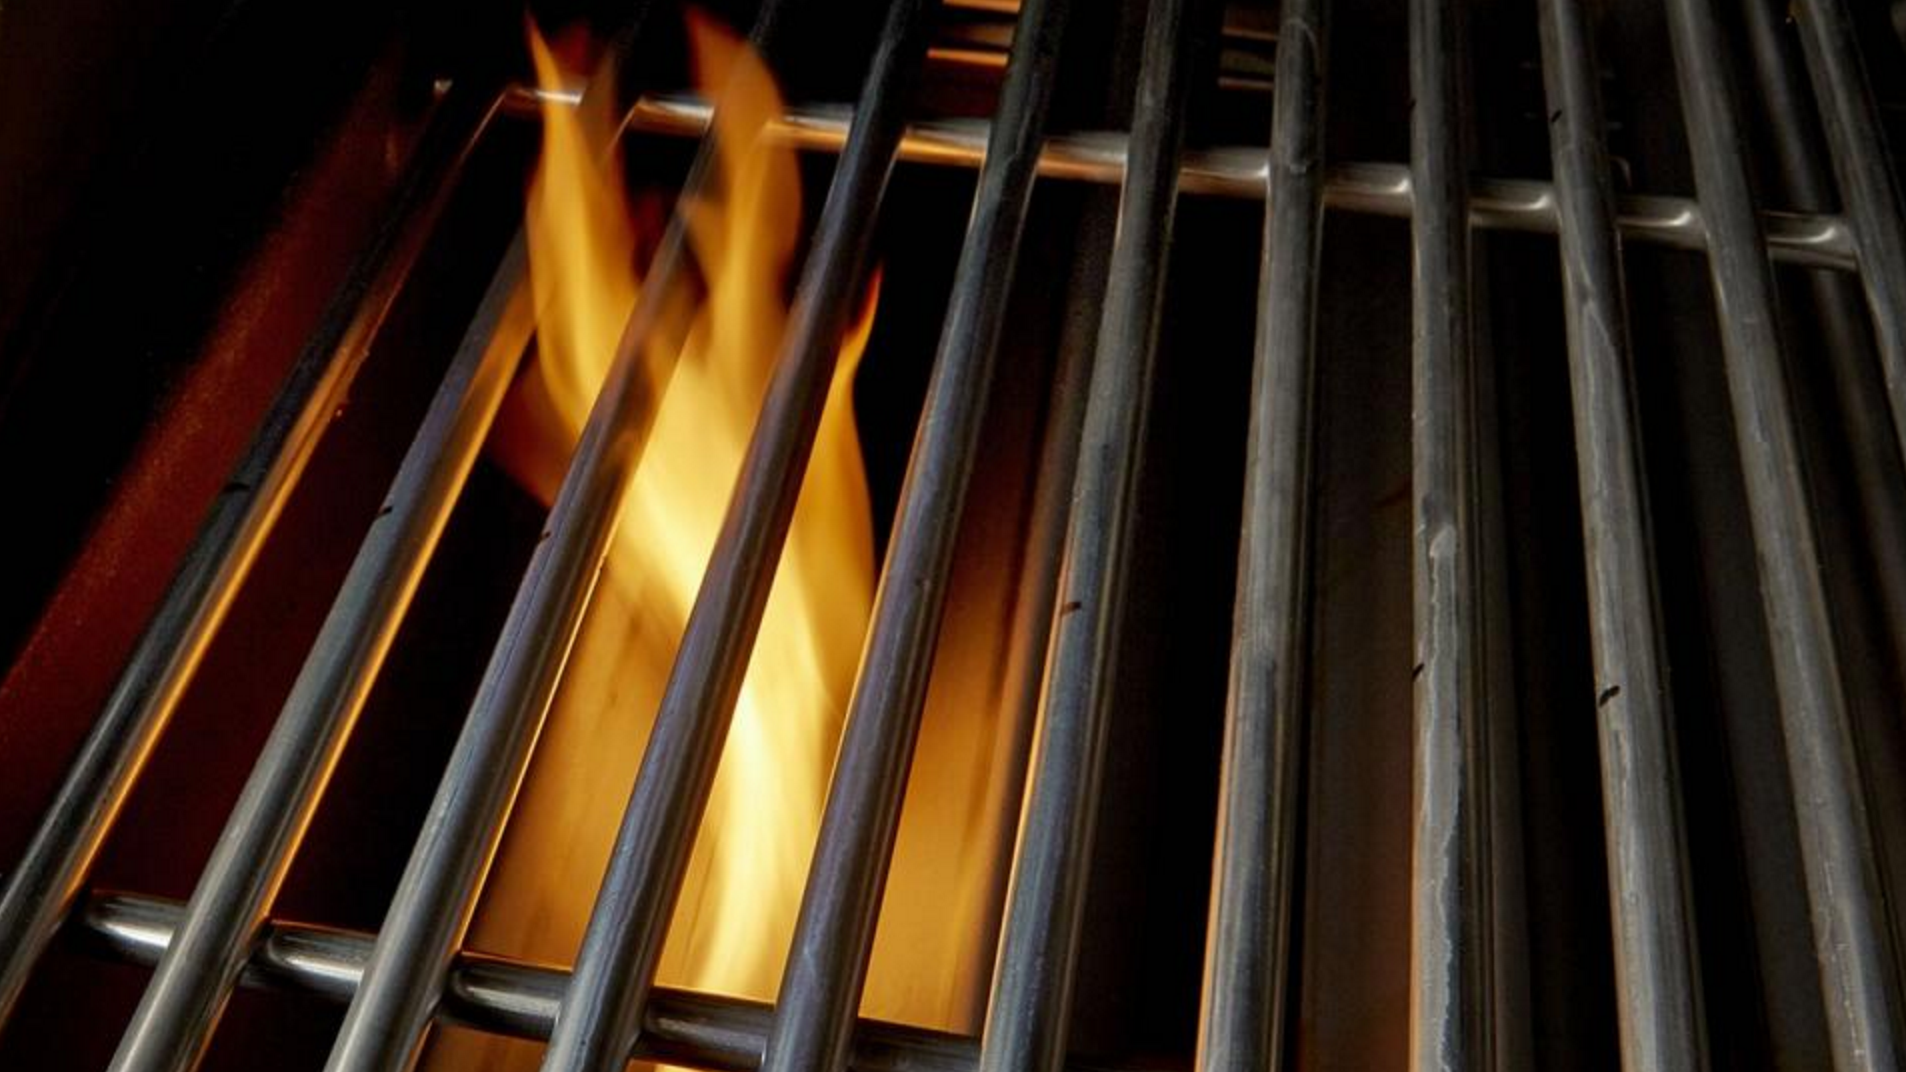 9mm diameter stainless steel cooking grates